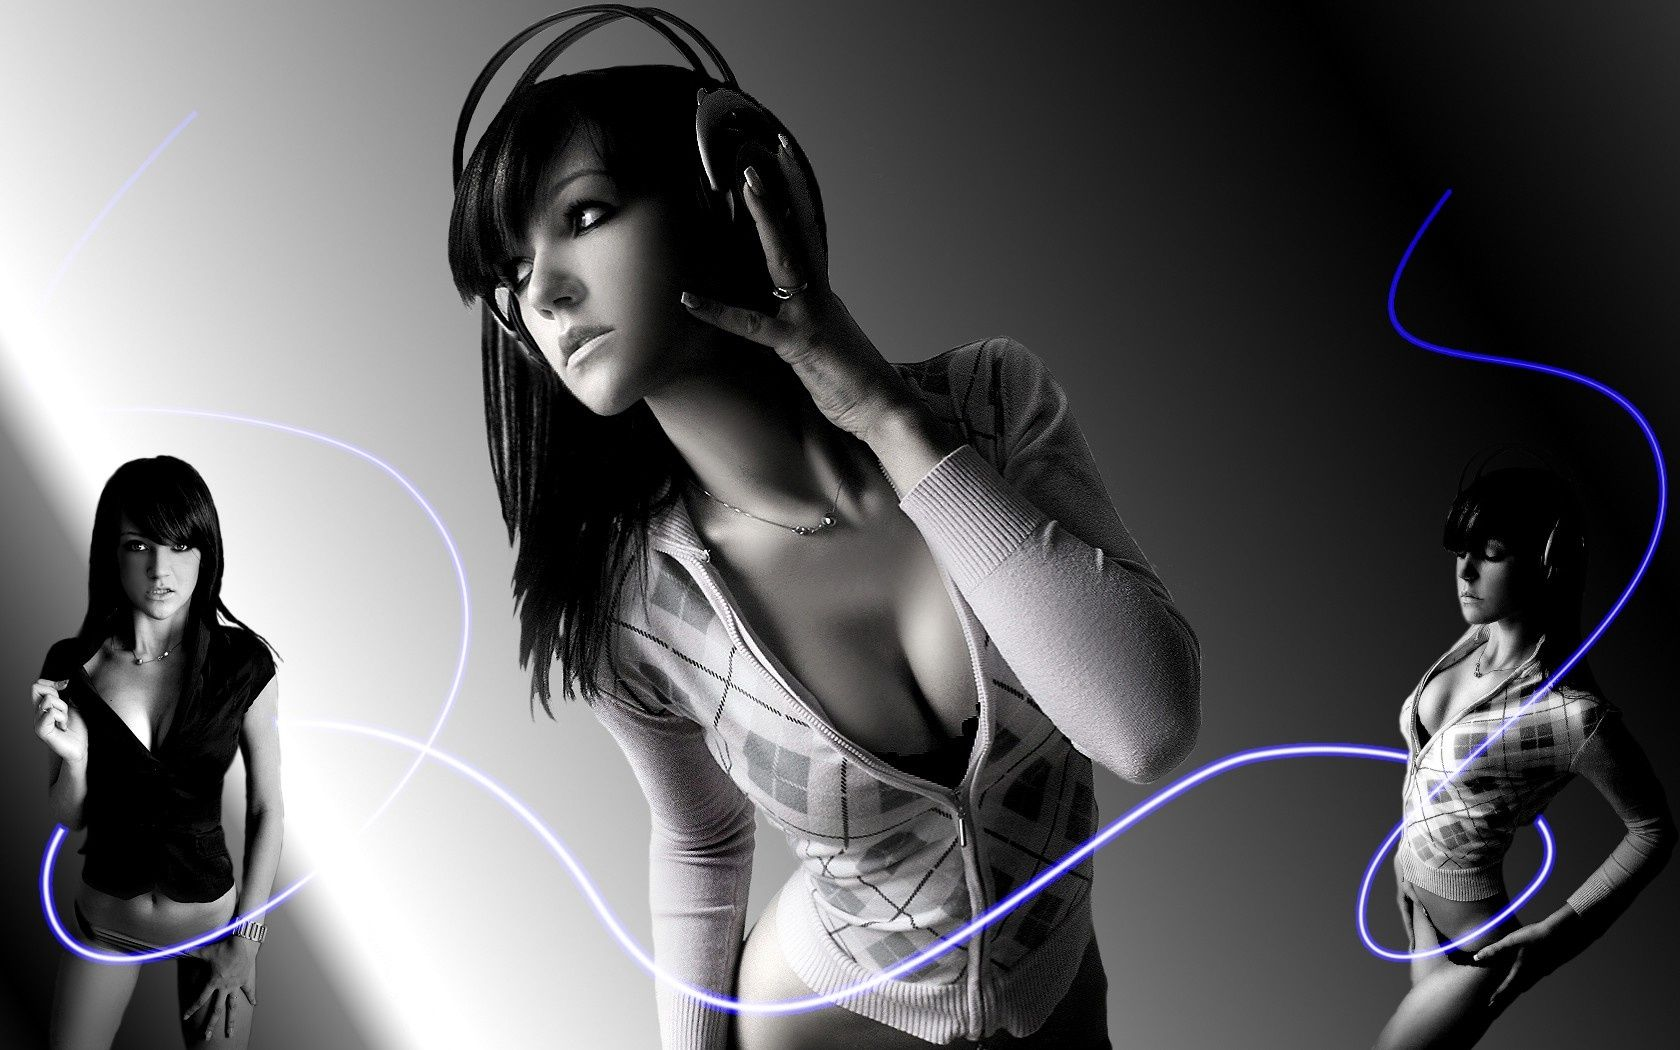 Wonderful Wallpaper Music Hot - 54bee469a01cbd2824f0ccfd2b511969  Snapshot_80969.jpg